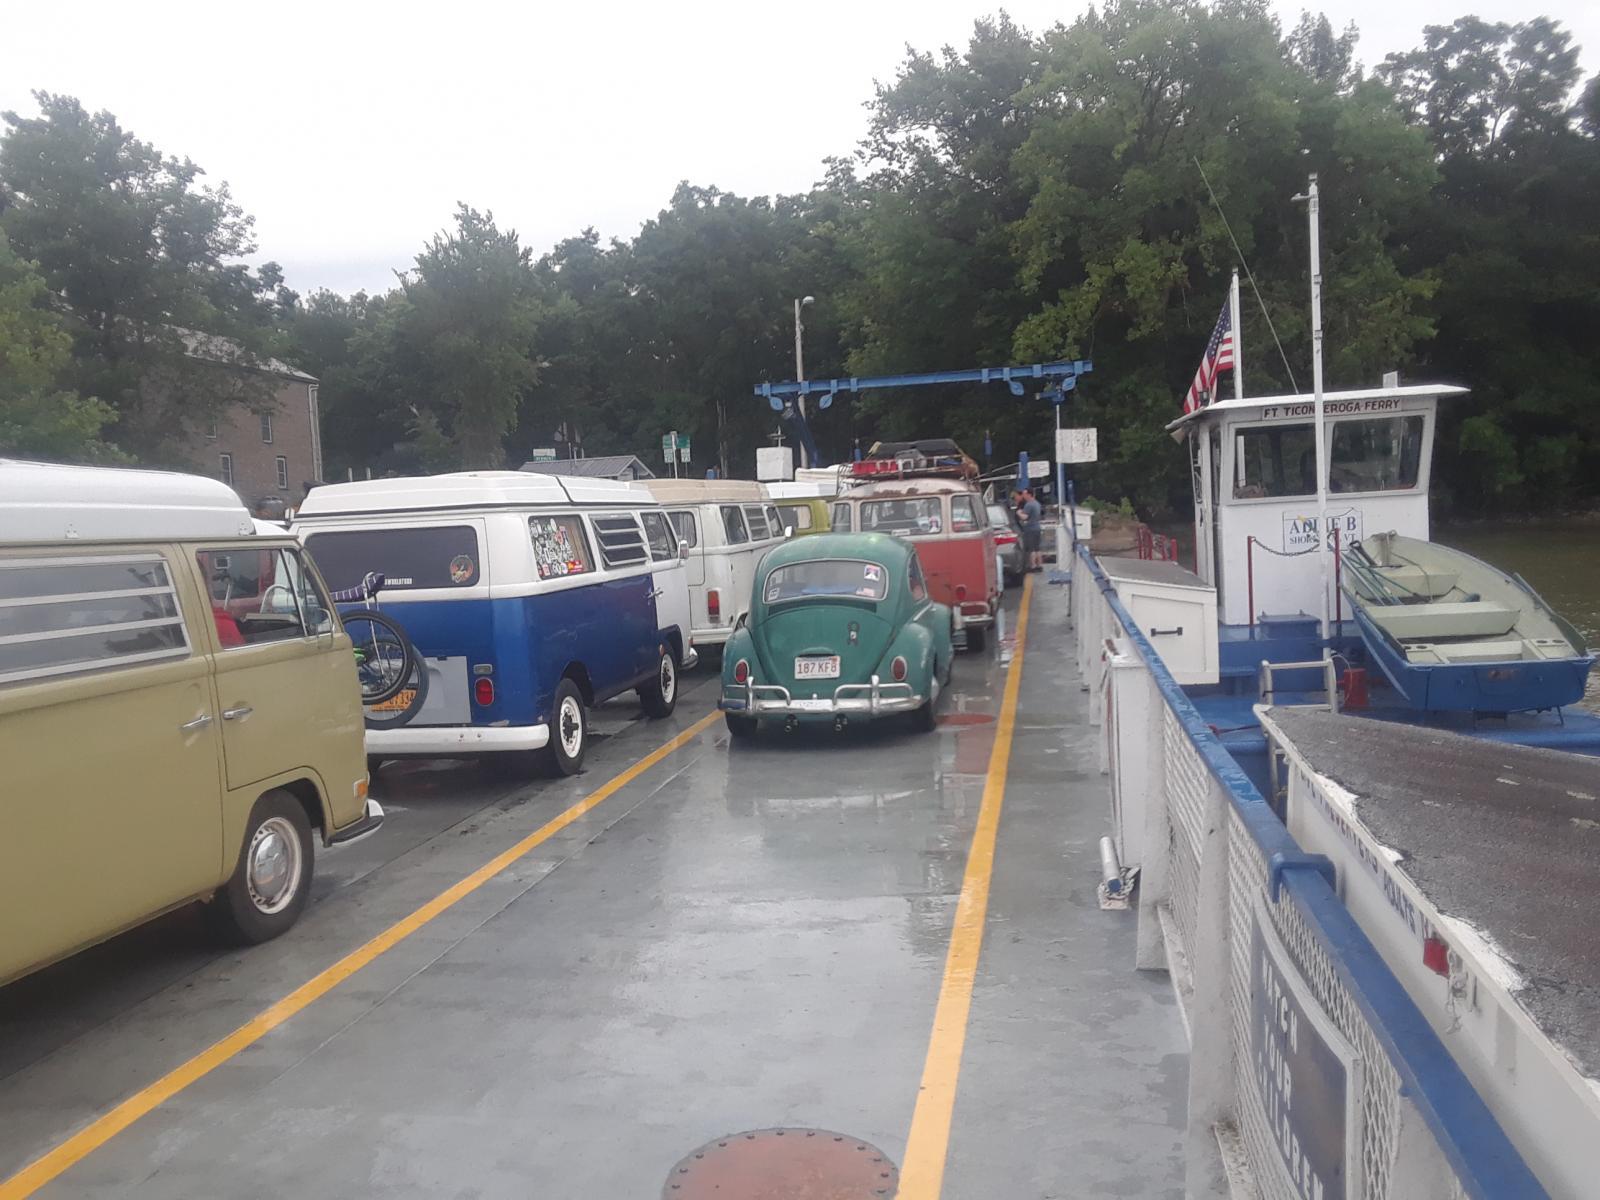 Aircooled Vws on Ticonderoga Ferry August 22, 2019.